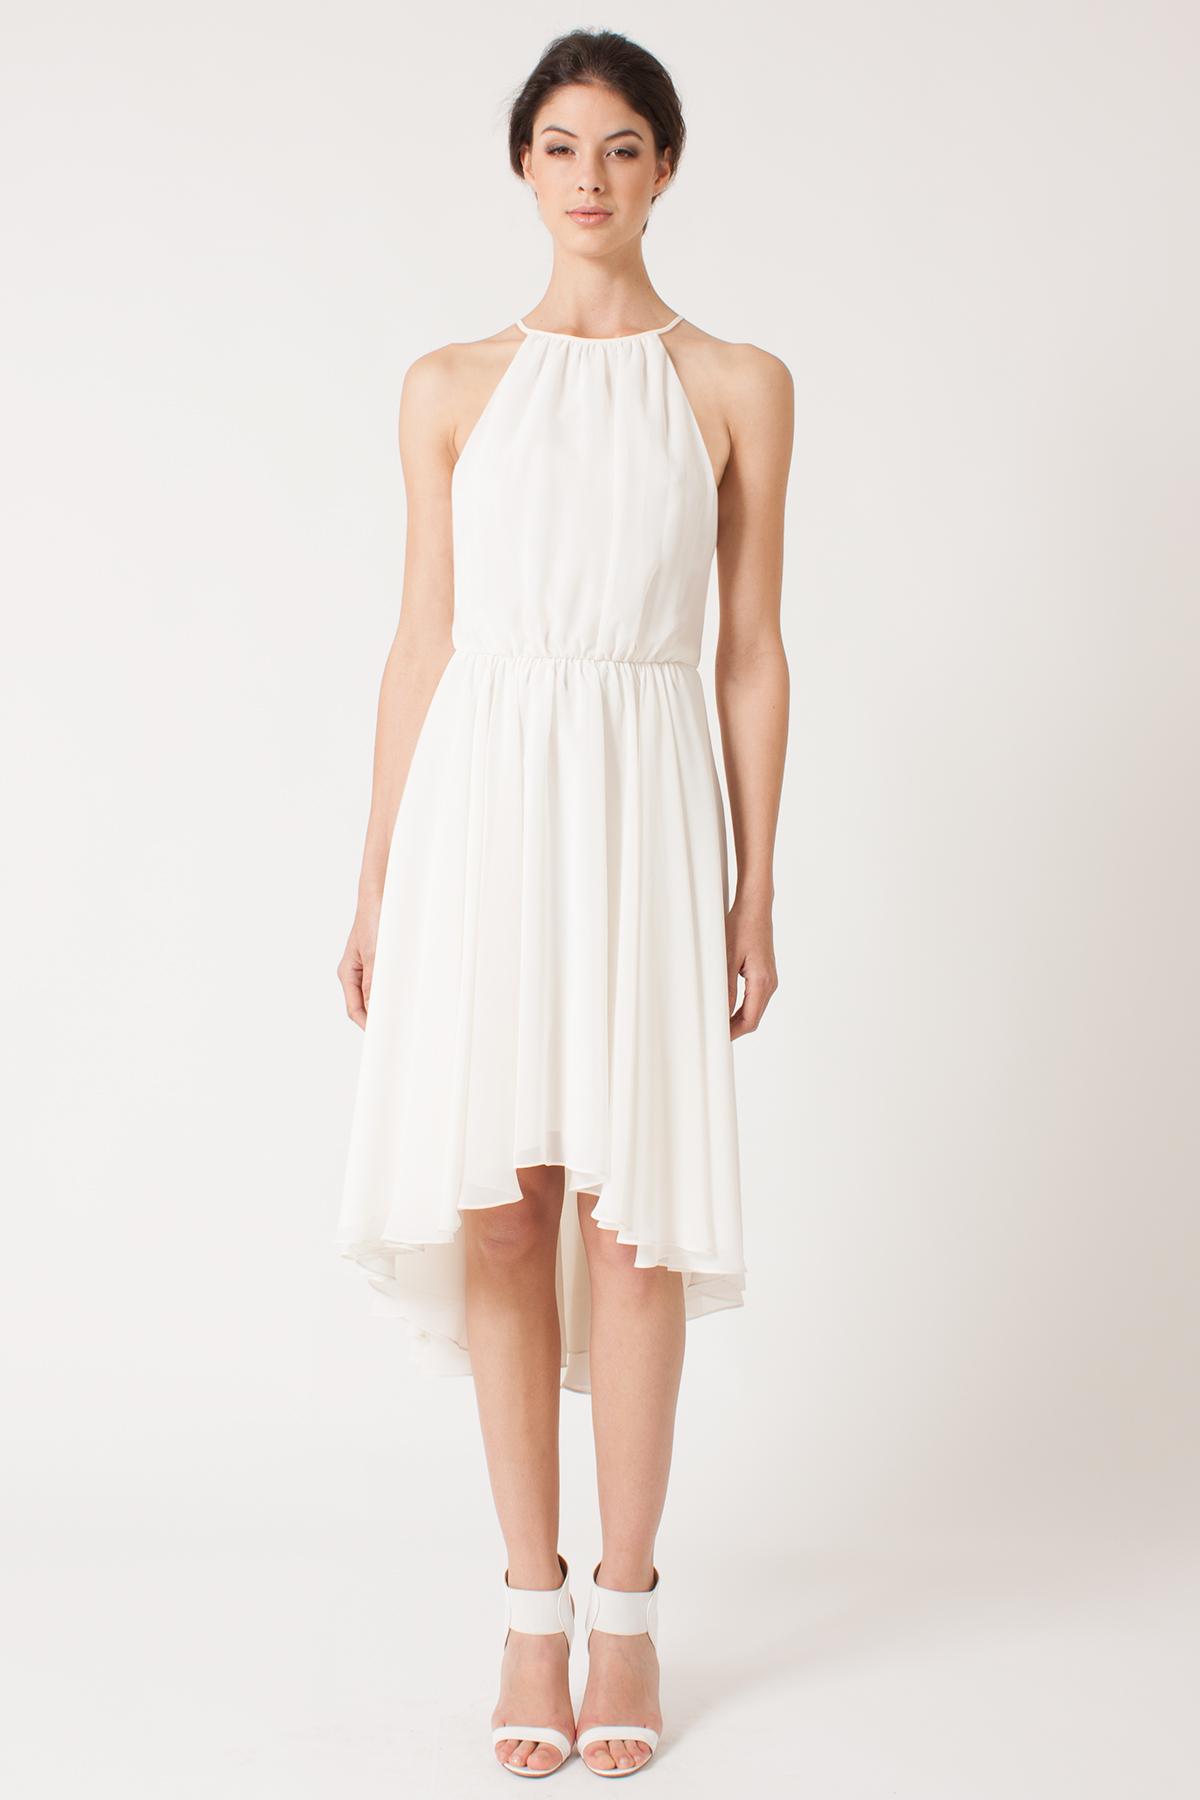 Black Halo Azalea Halter Dress In Chiffon In White Lyst